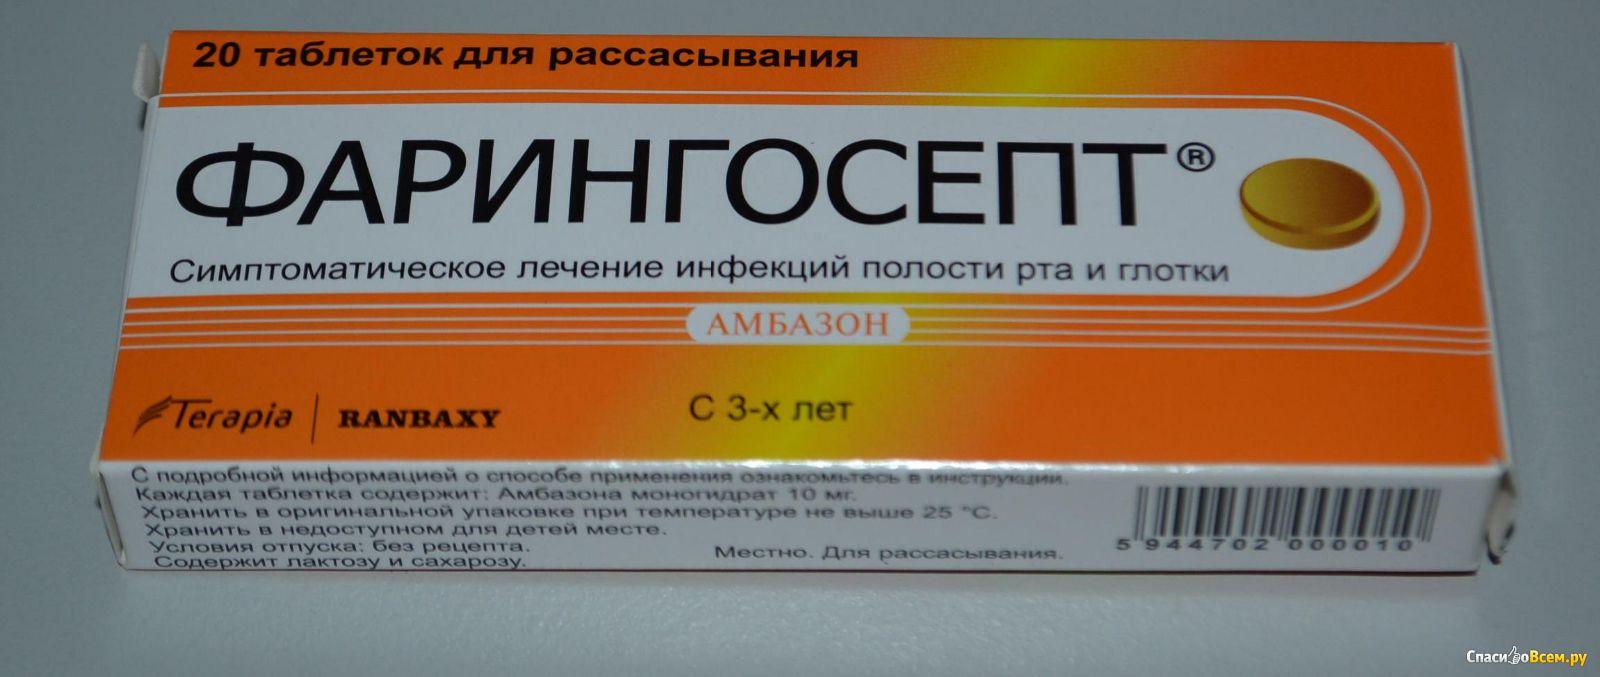 Таблетки для ра 15 фотография